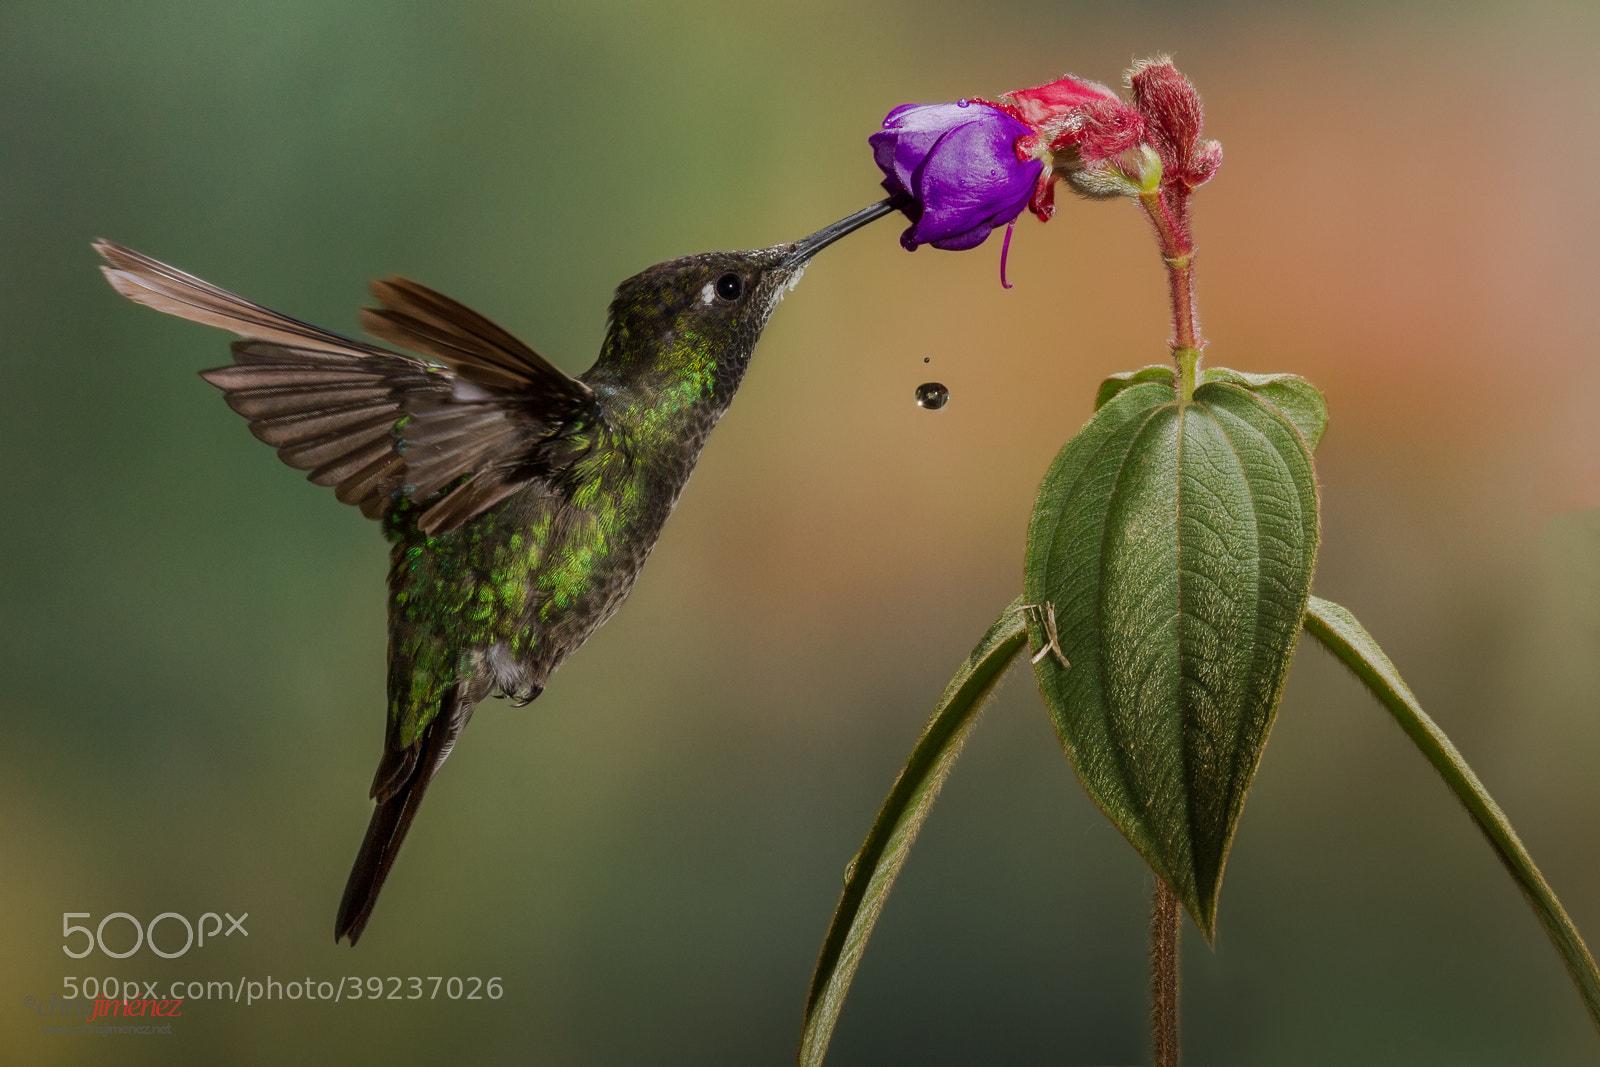 Photograph Magnificent Hummingbird by Chris Jimenez on 500px